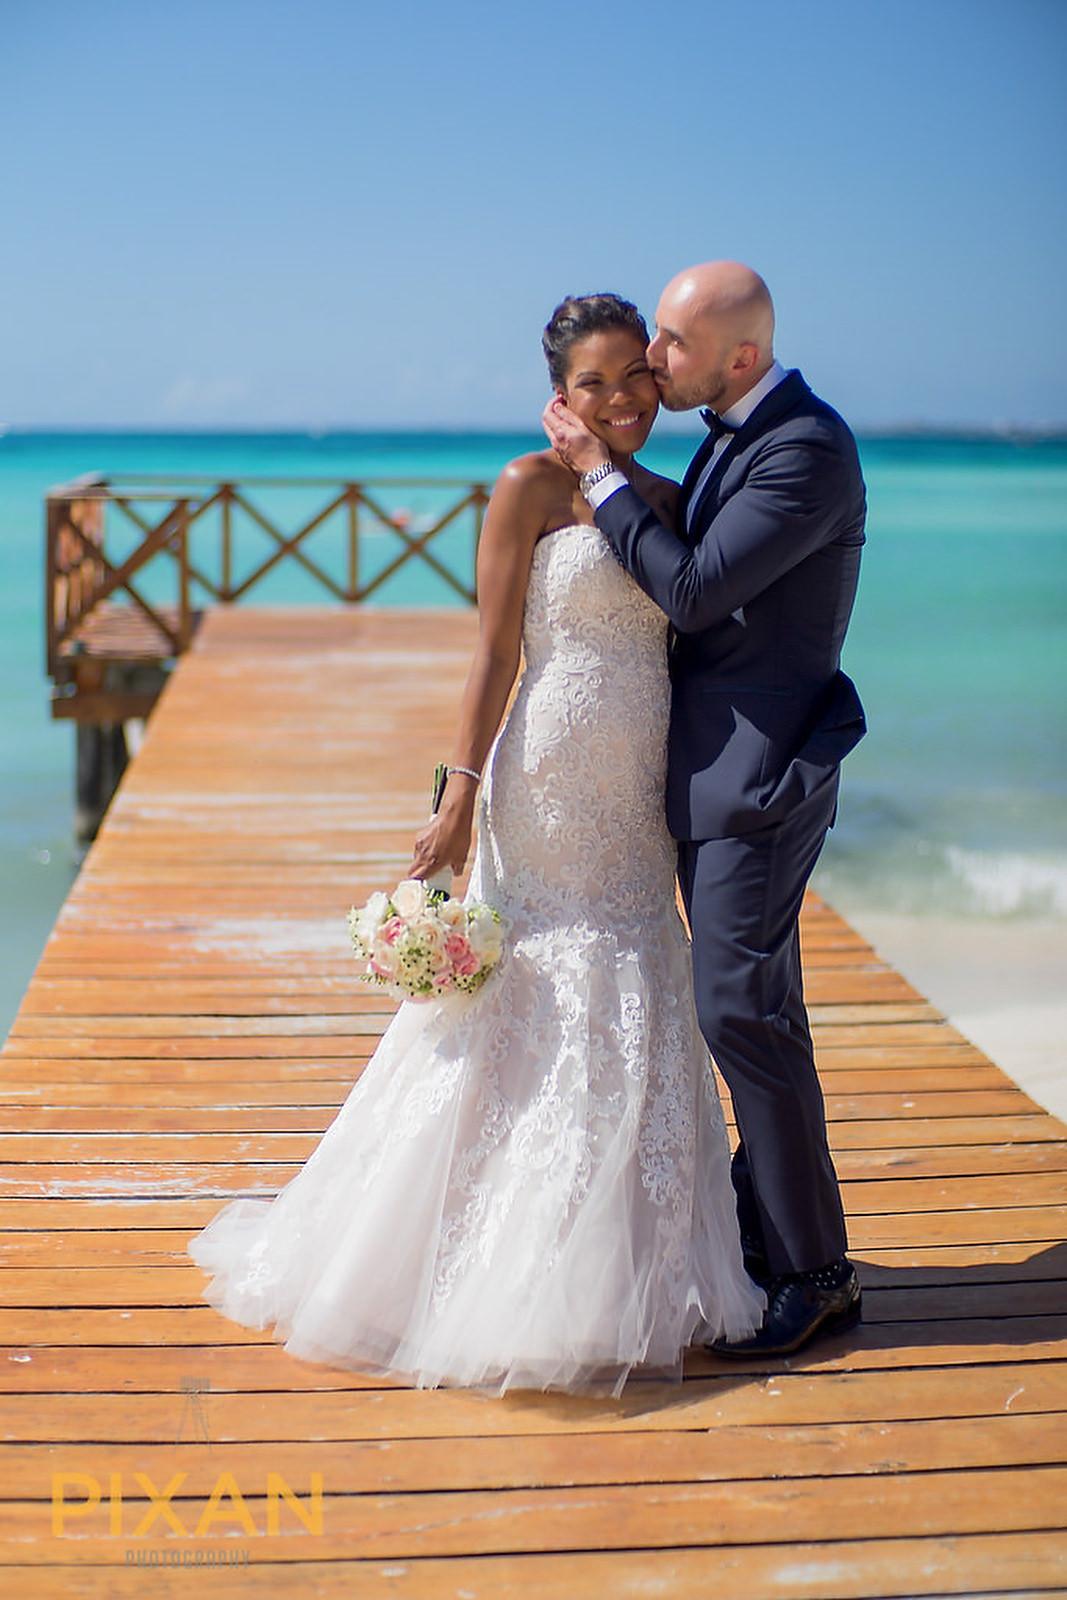 Hyatt Ziva Cancun wedding kiss